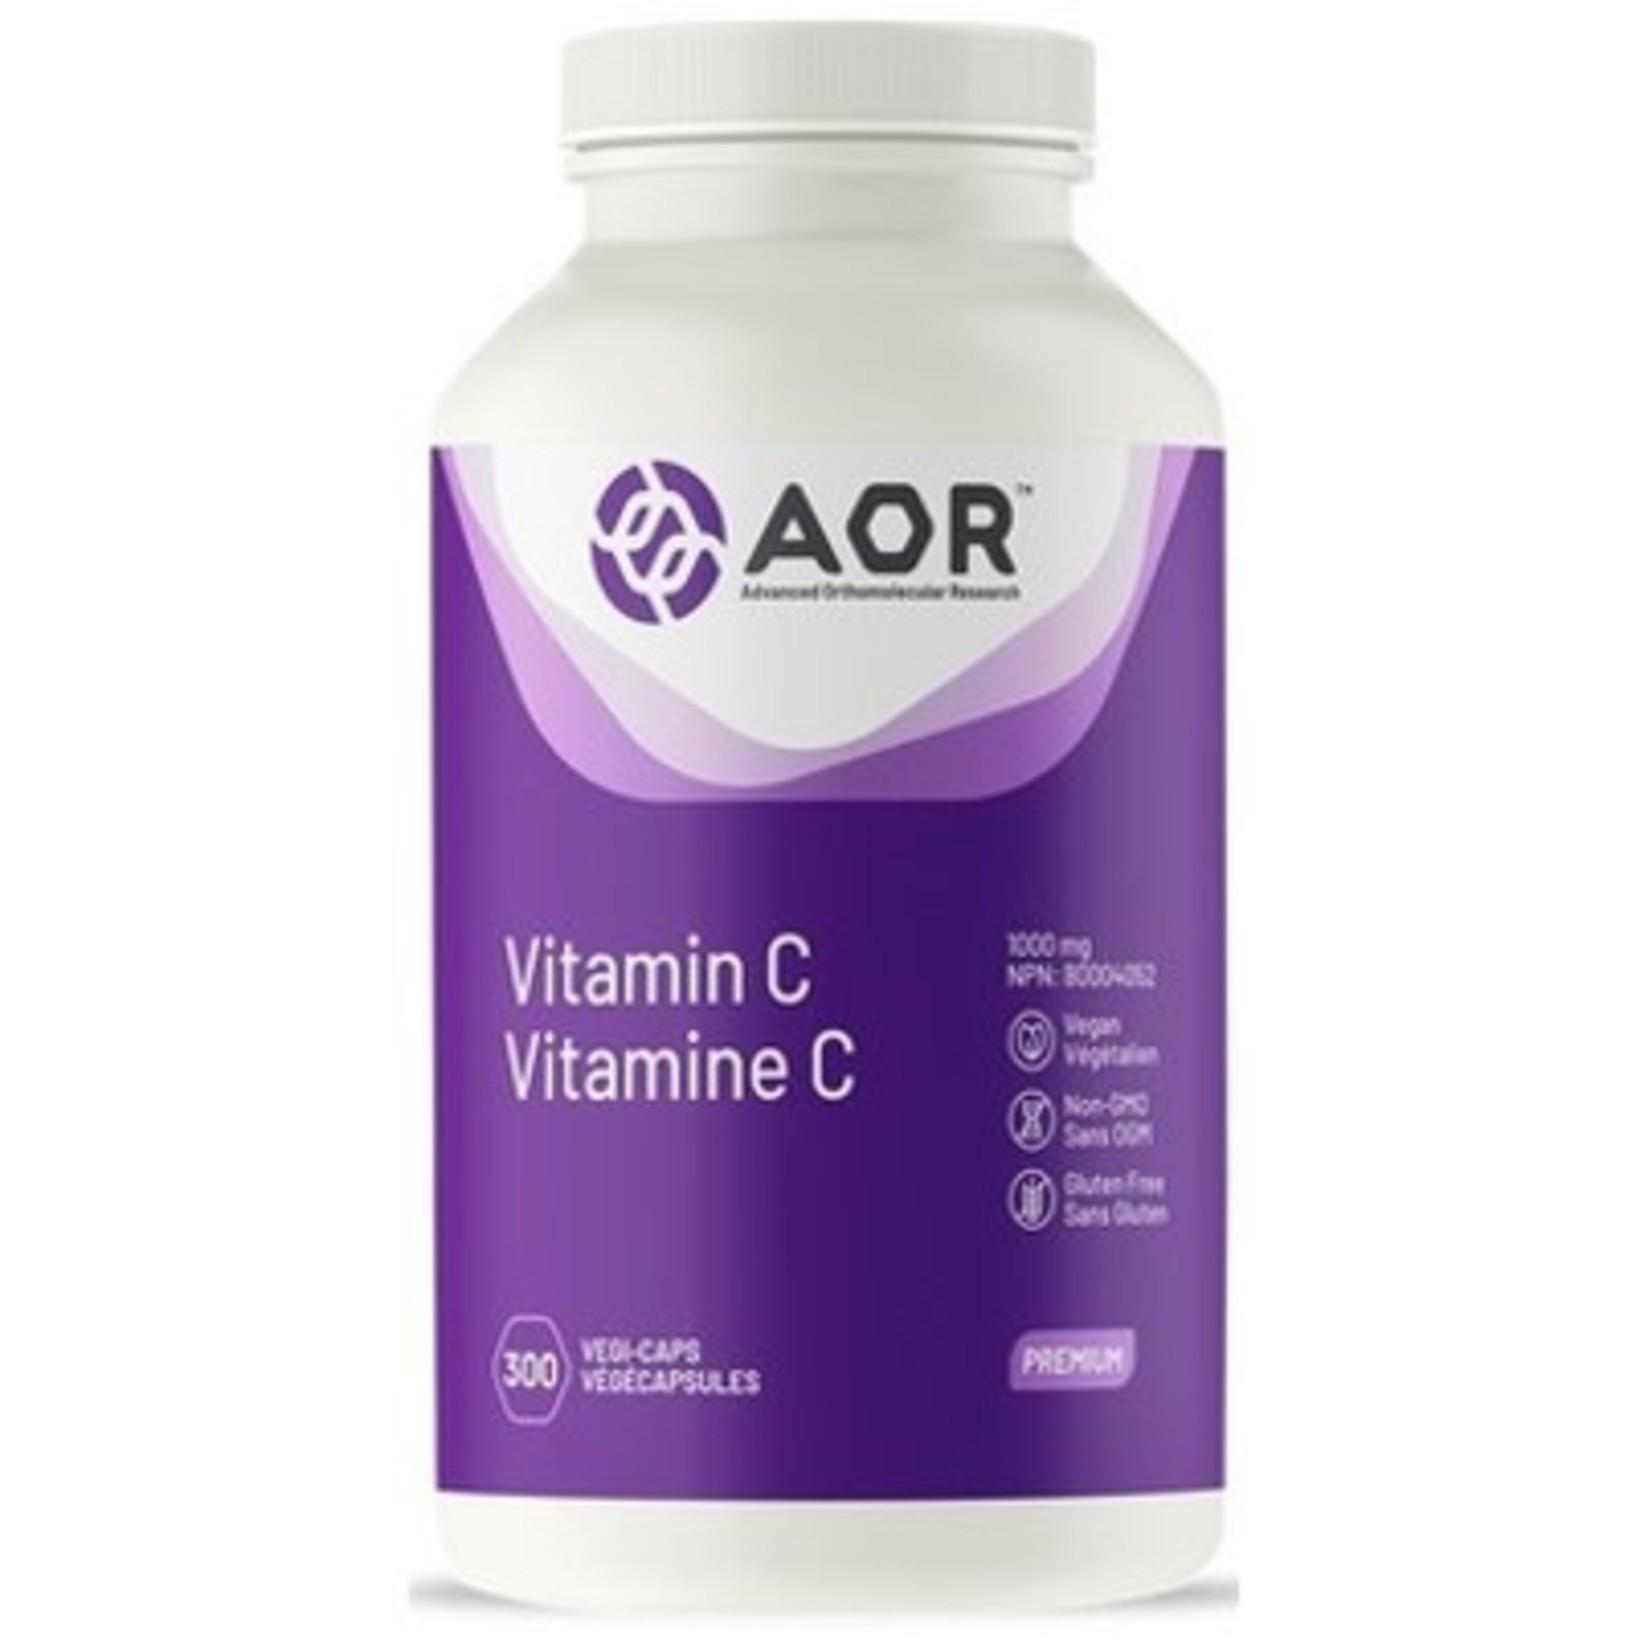 AOR AOR Vitamin C 1000mg - 300 caps